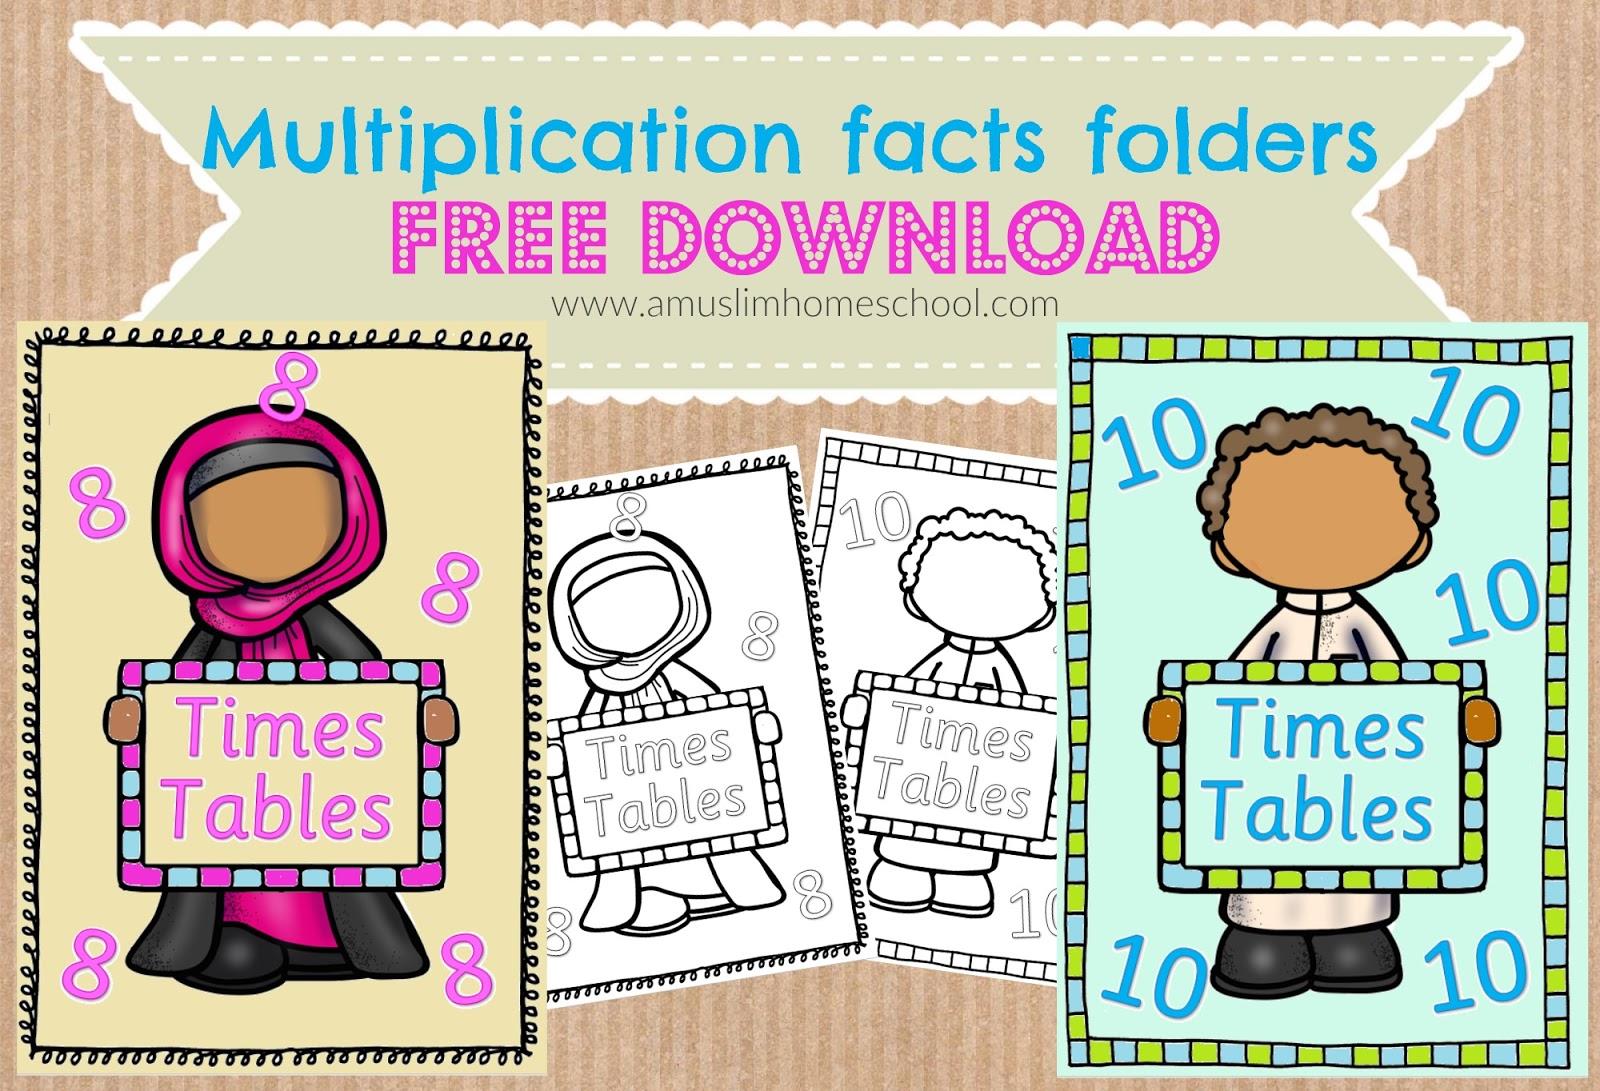 A Muslim Homeschool: Multiplication Fact Foldersmaking regarding Multiplication Lapbook Printable